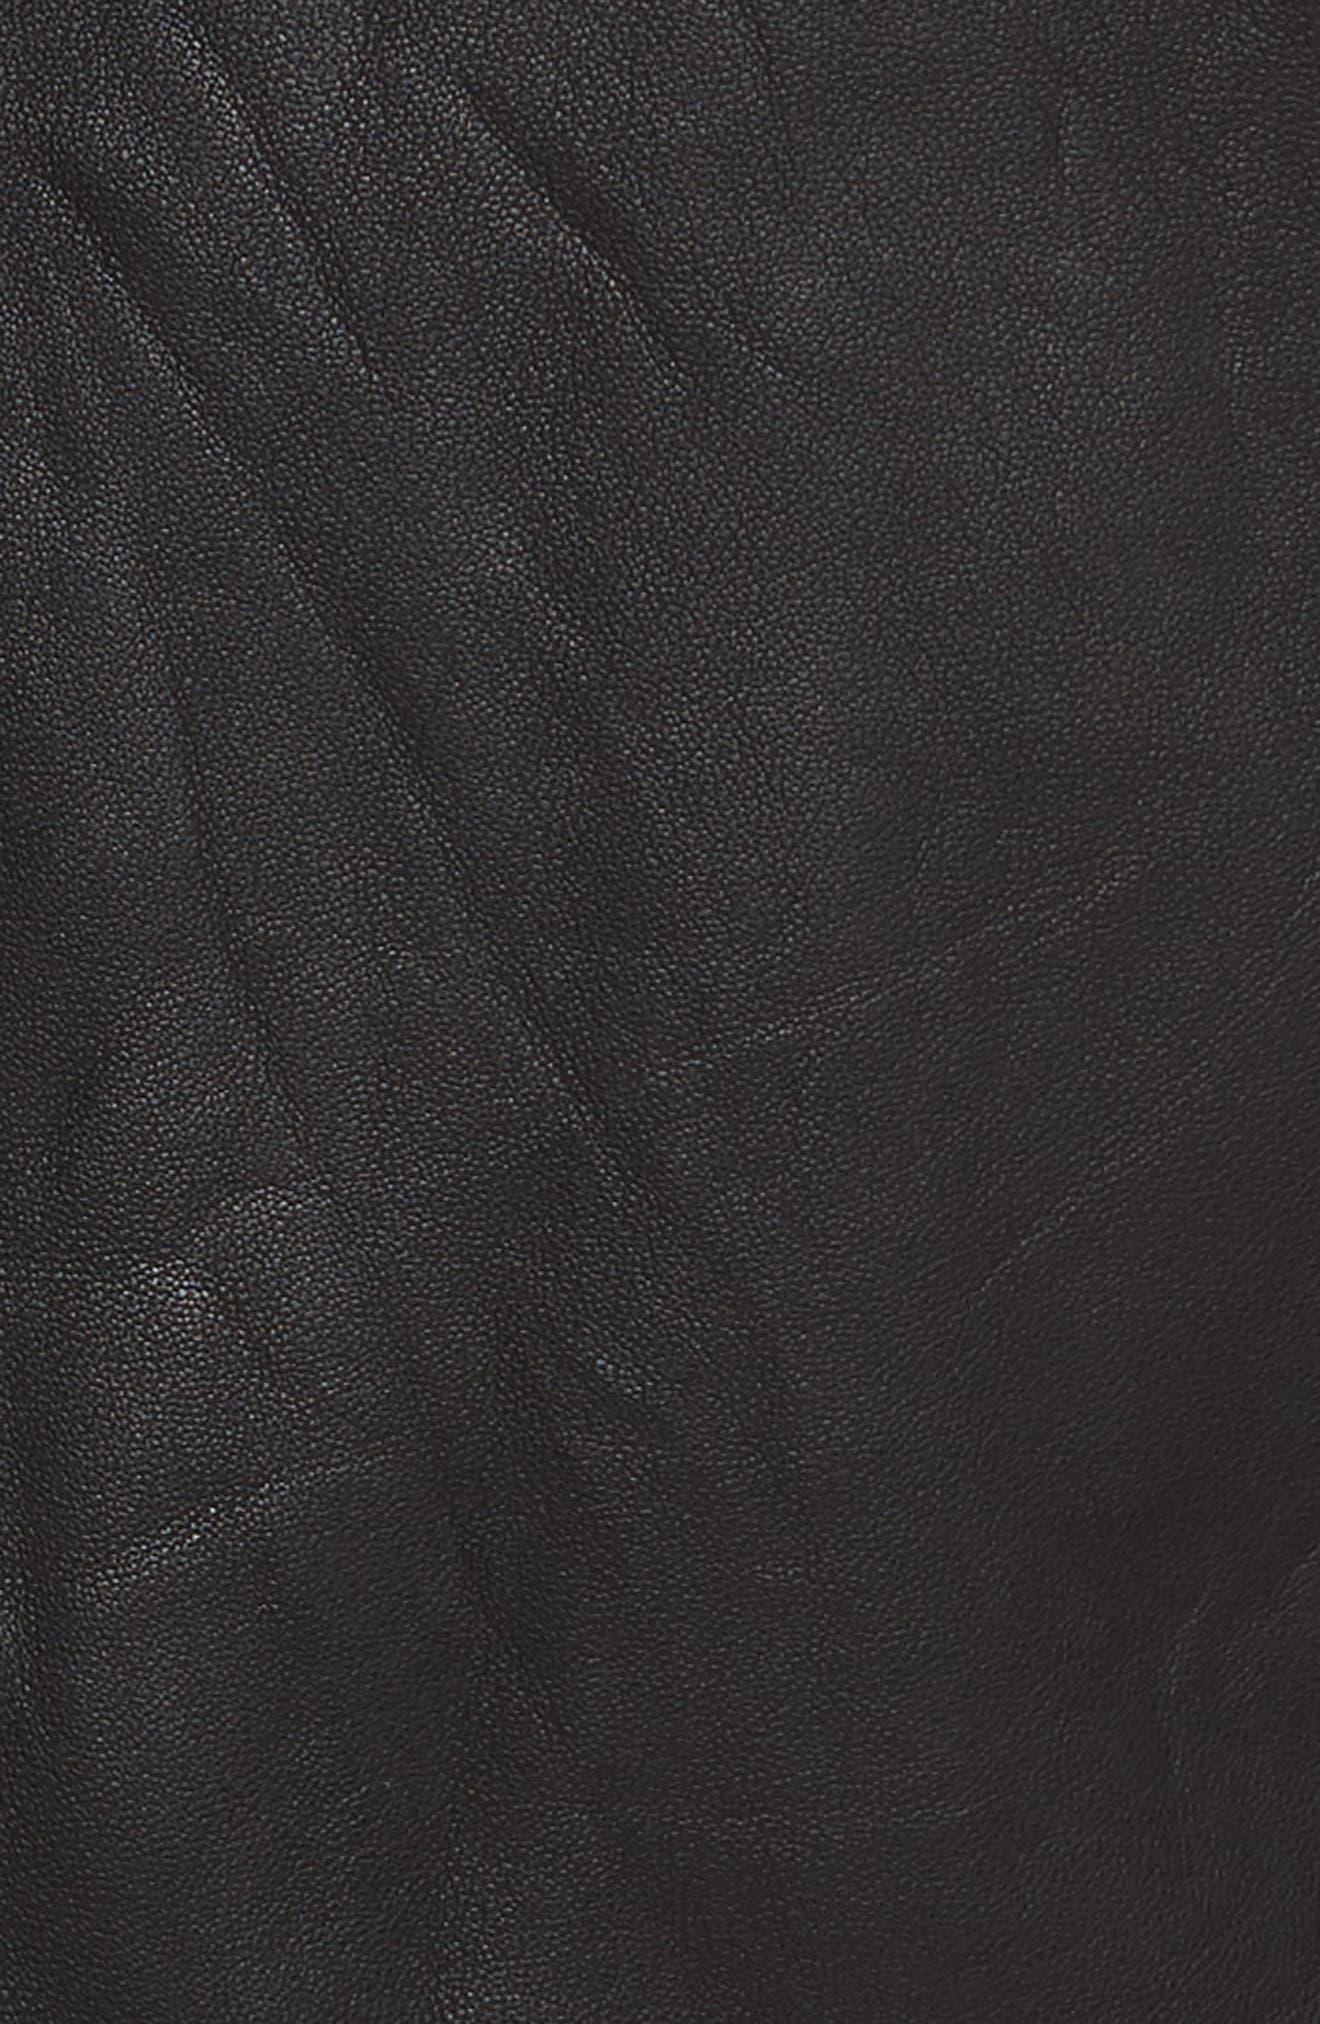 Cross Front Leather Jacket,                             Alternate thumbnail 6, color,                             BLACK